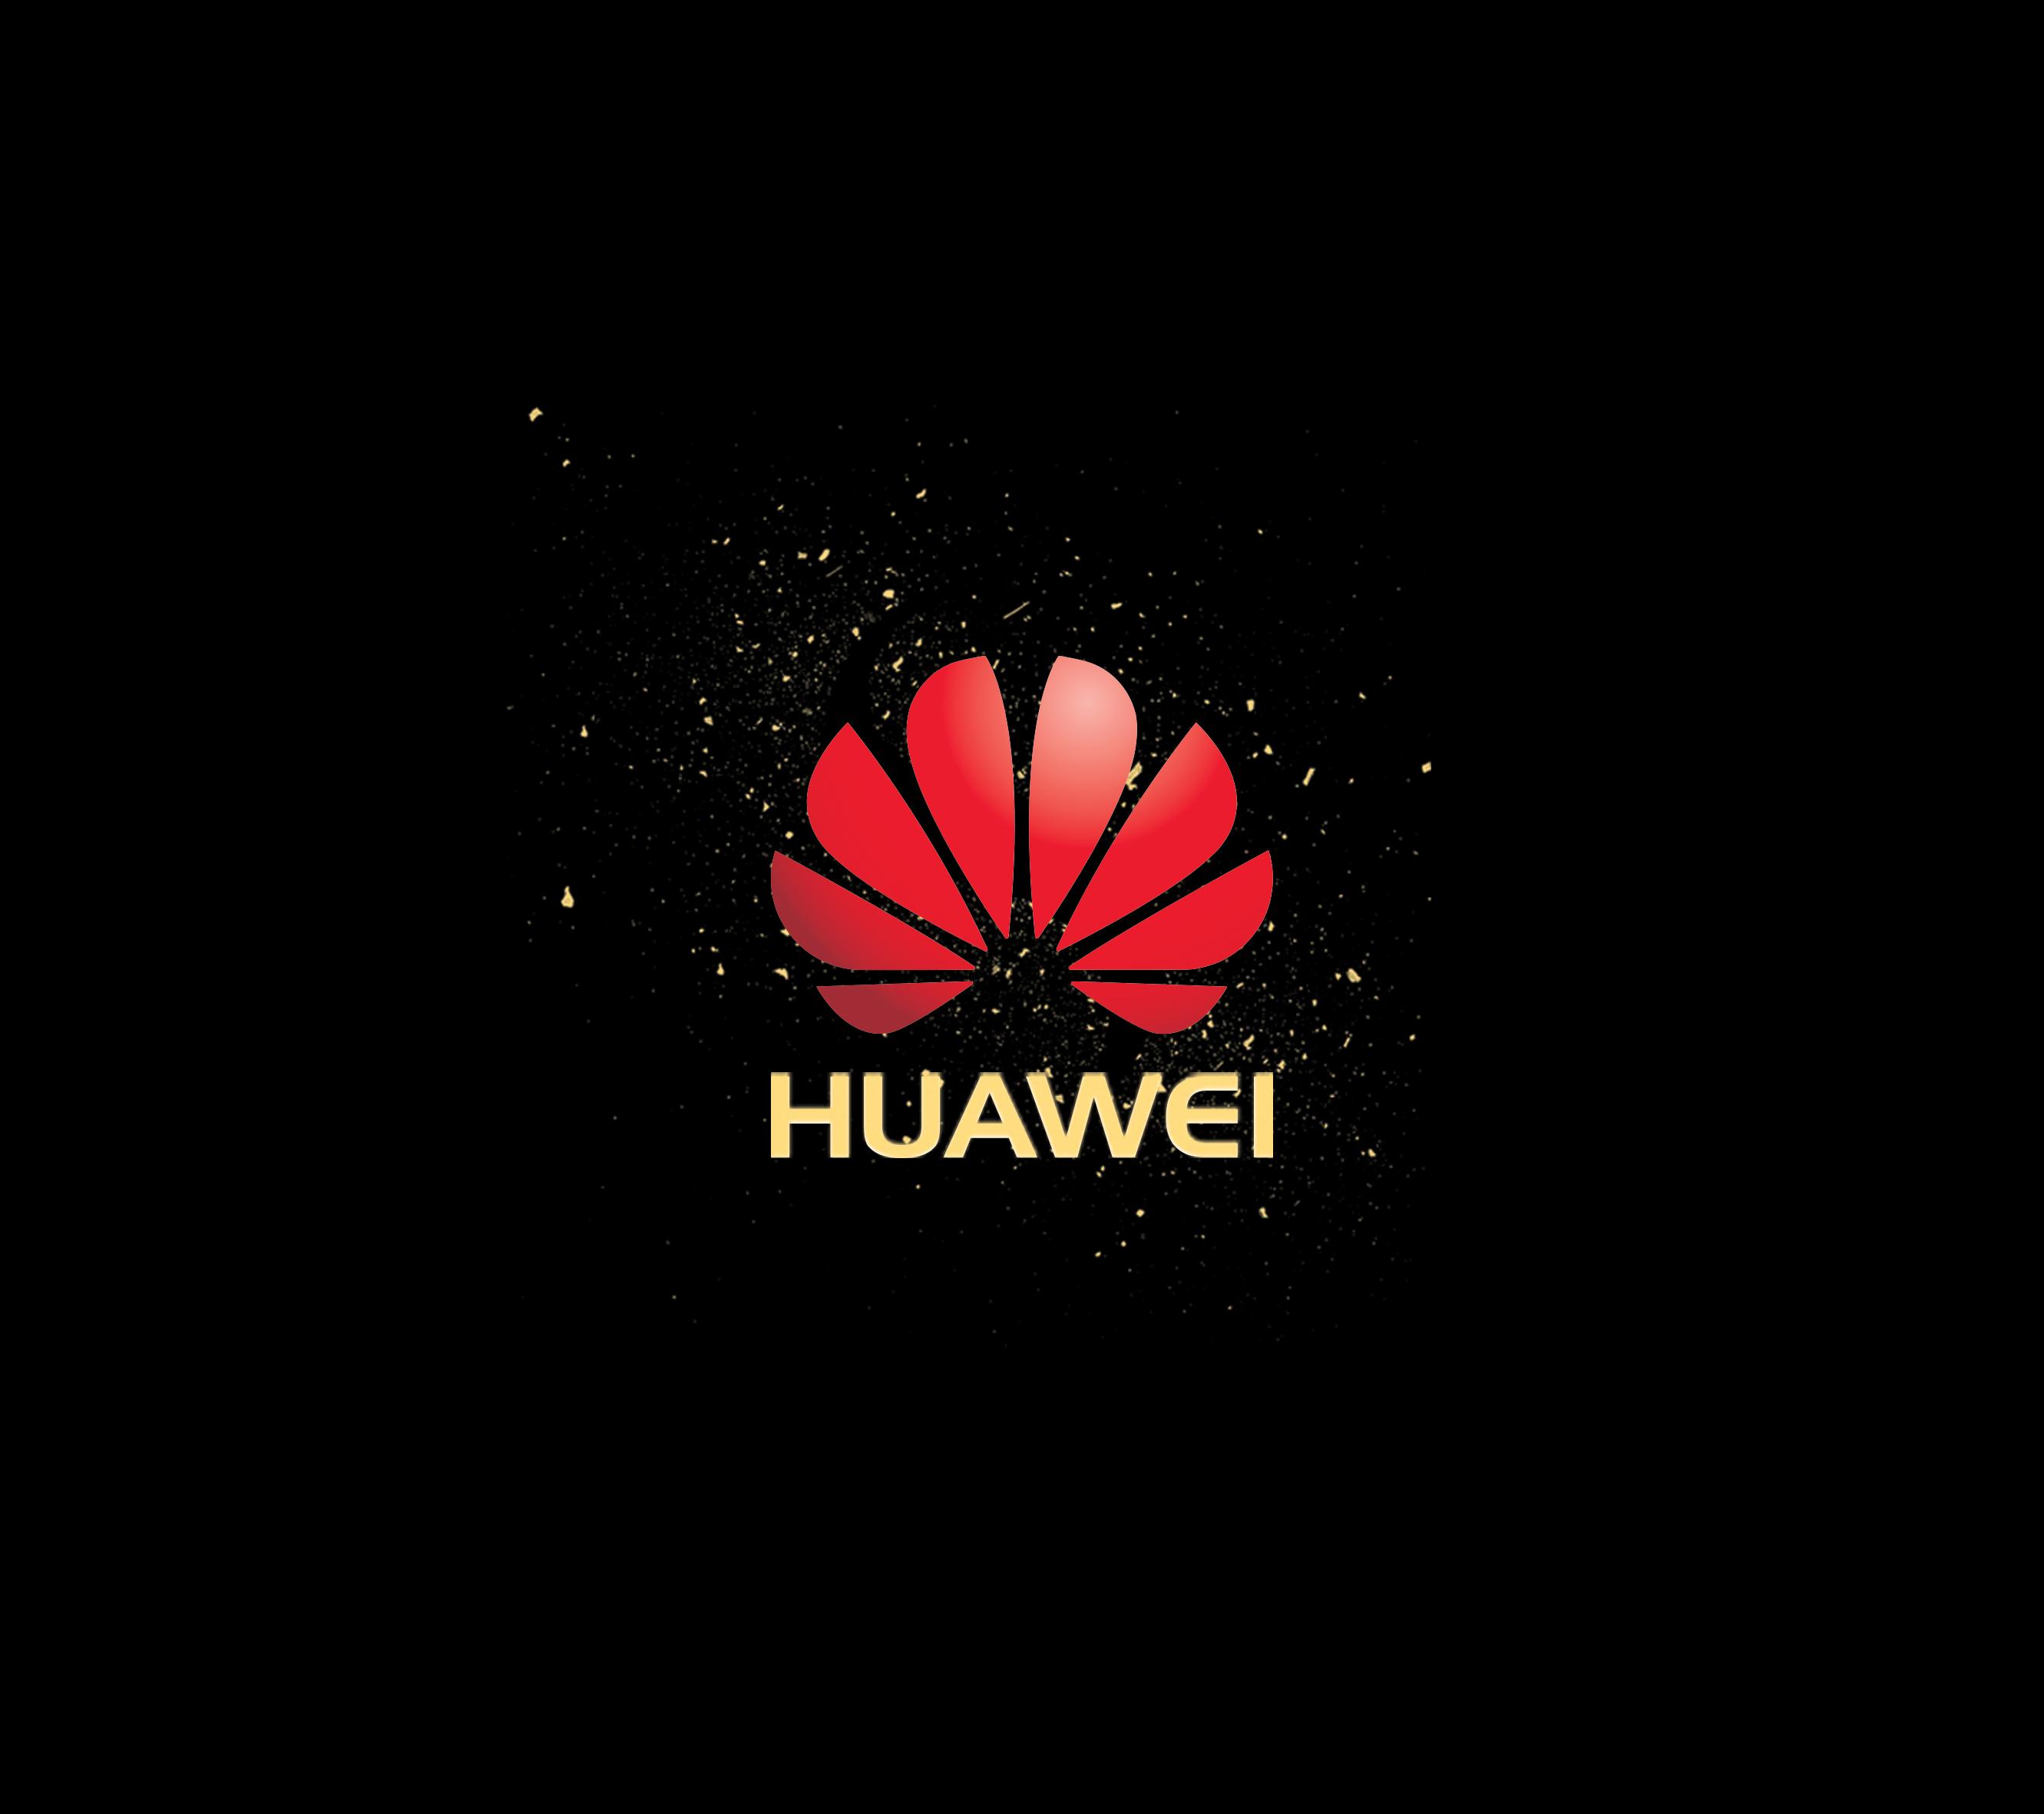 Huawei te¿ chce mieæ swój sk³adany telefon